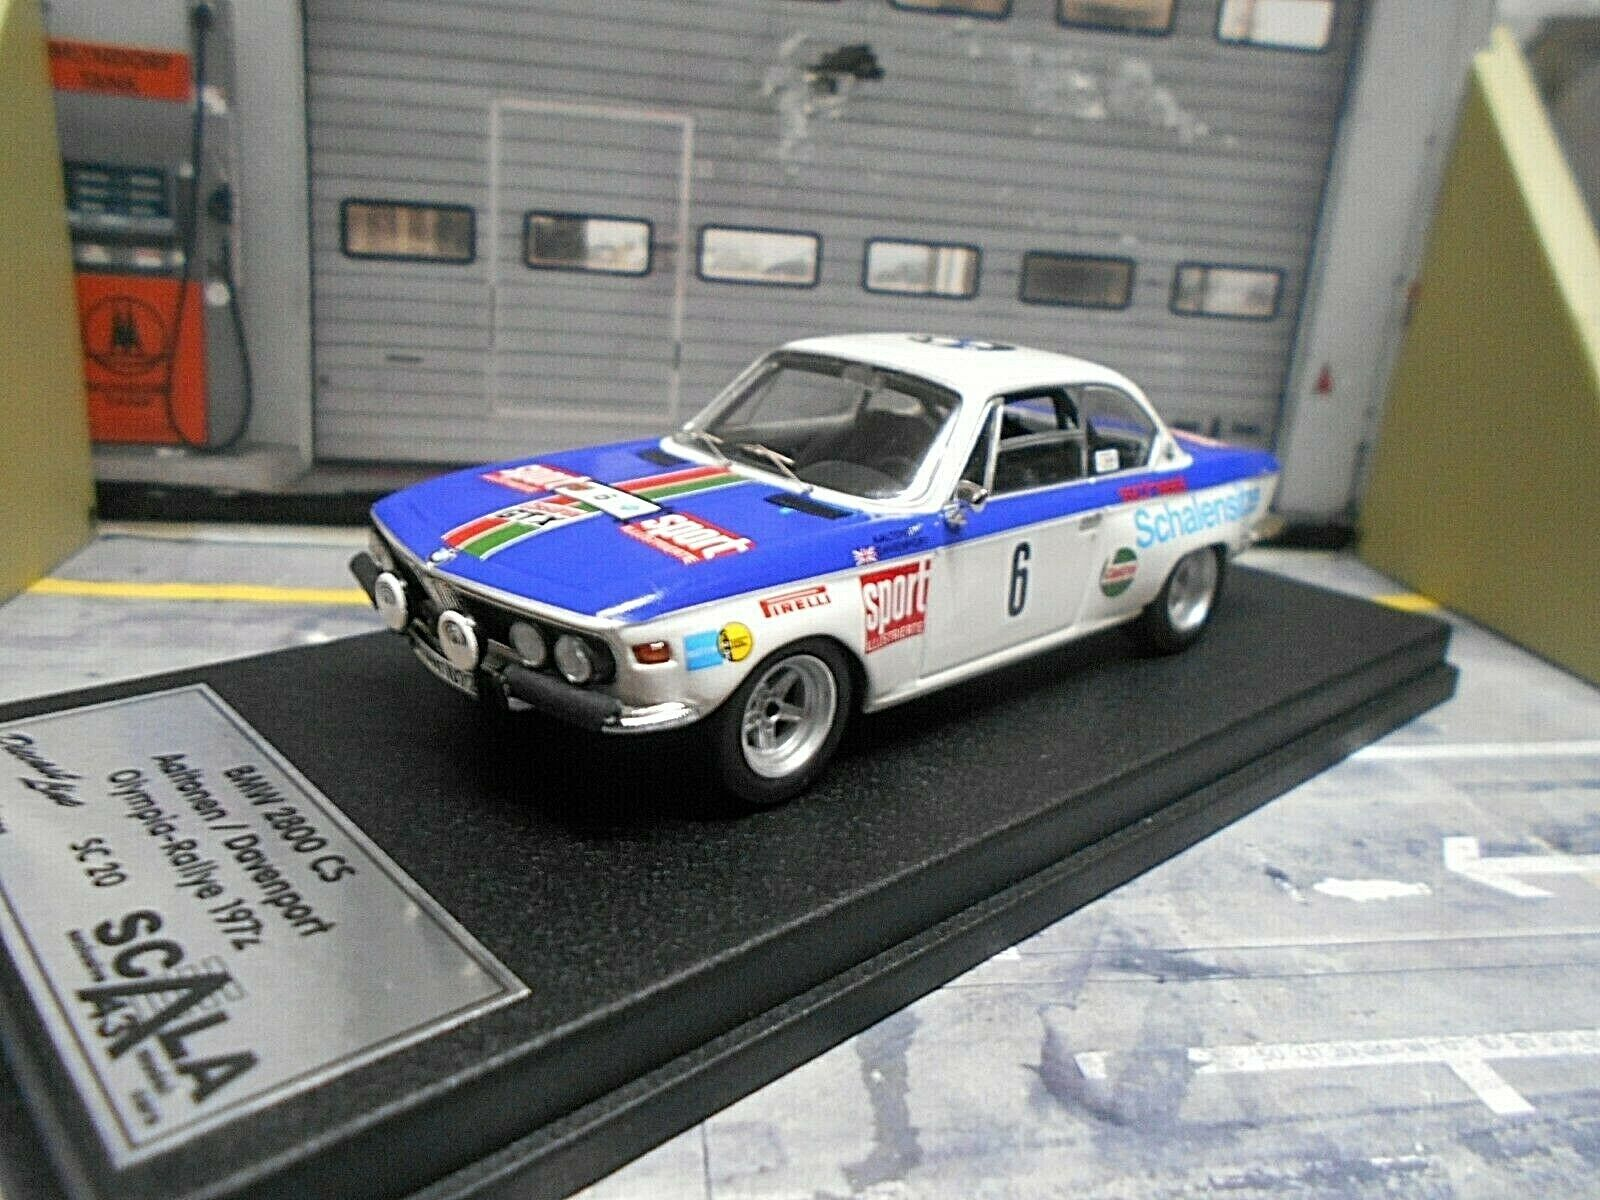 Bmw 2800 CS coupé rally Olympia 1972 Aaltonen castrol Trofeu Scala ed. 1 43